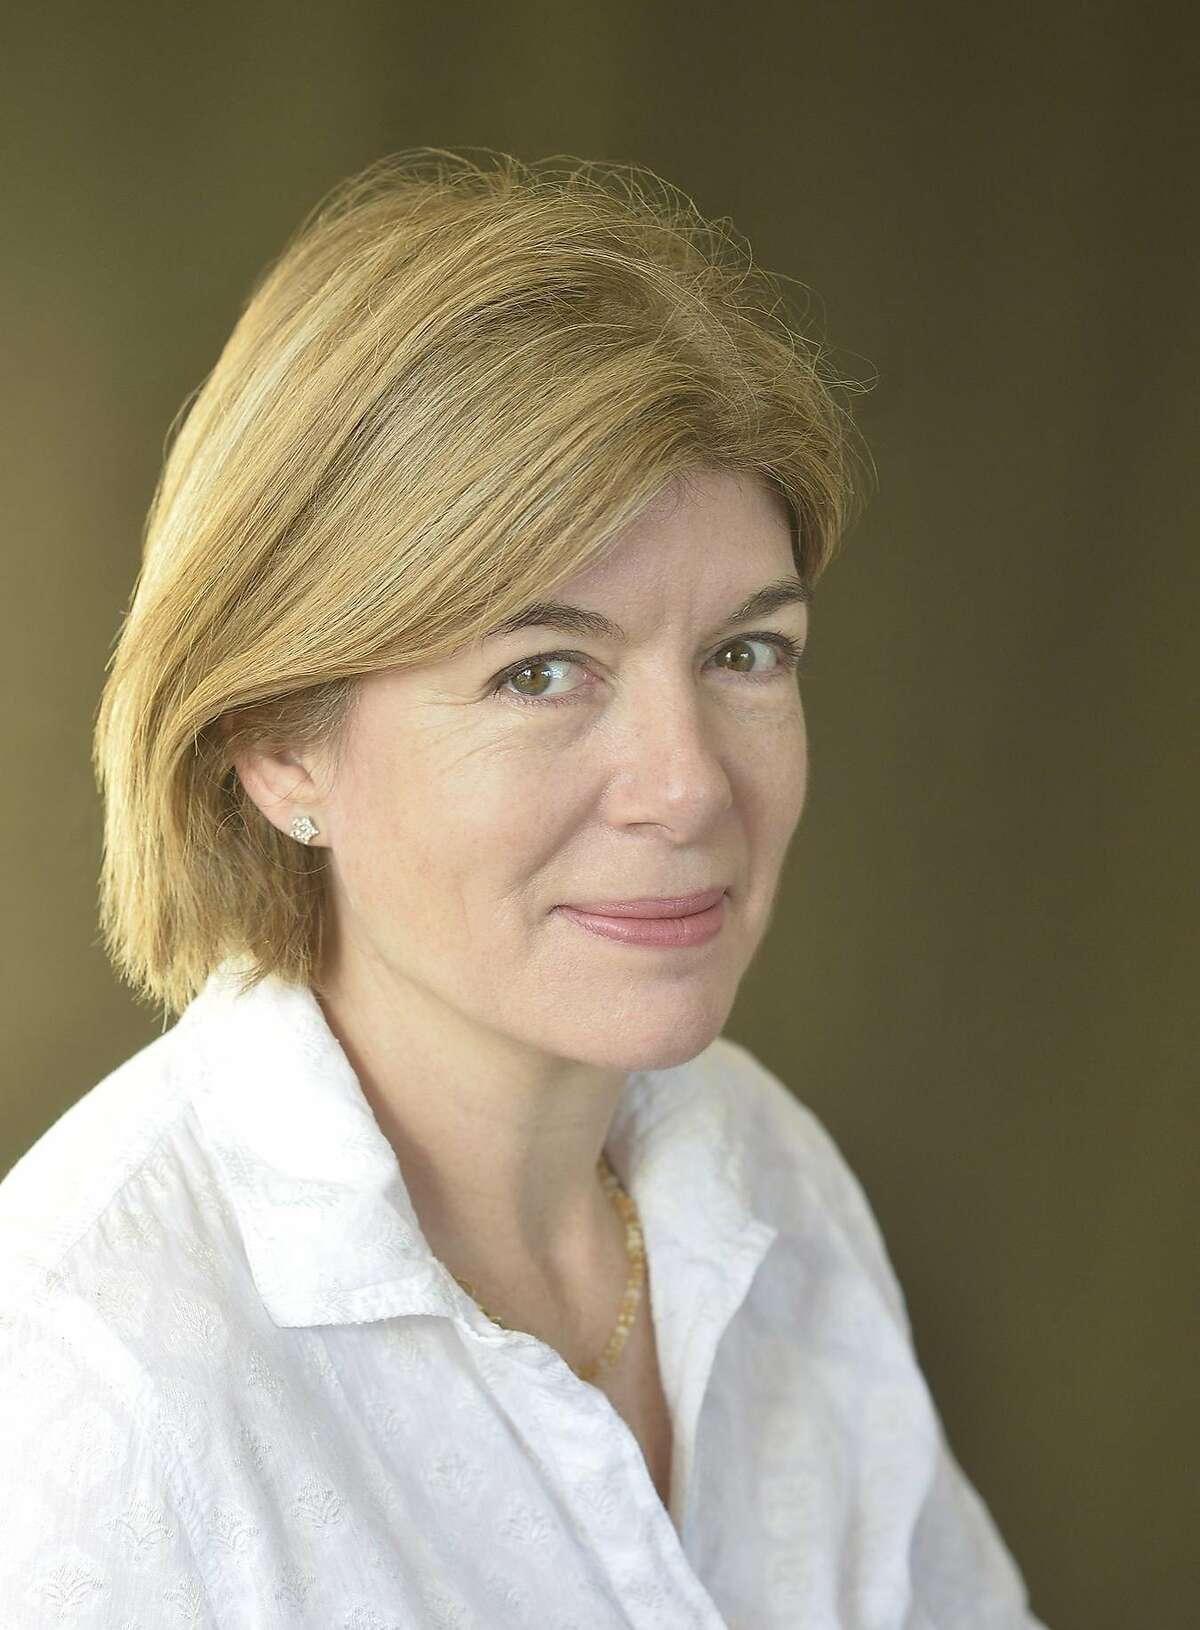 Author Claire Messud